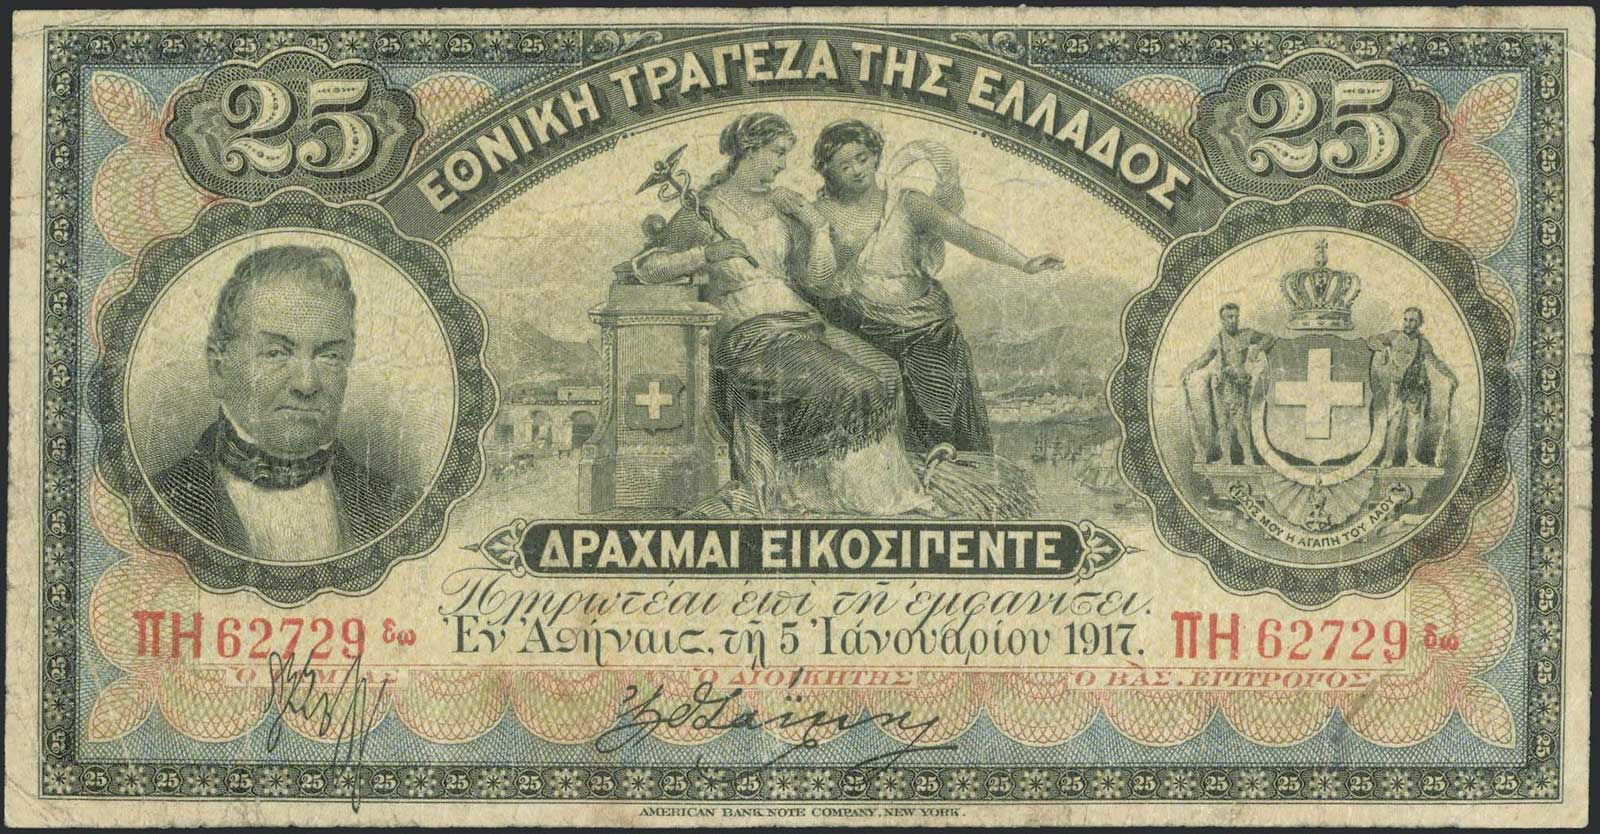 Lot 9260 - GREECE-  PAPER MONEY - BANKNOTES National Bank of Greece -  A. Karamitsos Public & LIVE Bid Auction 610 Coins, Medals & Banknotes